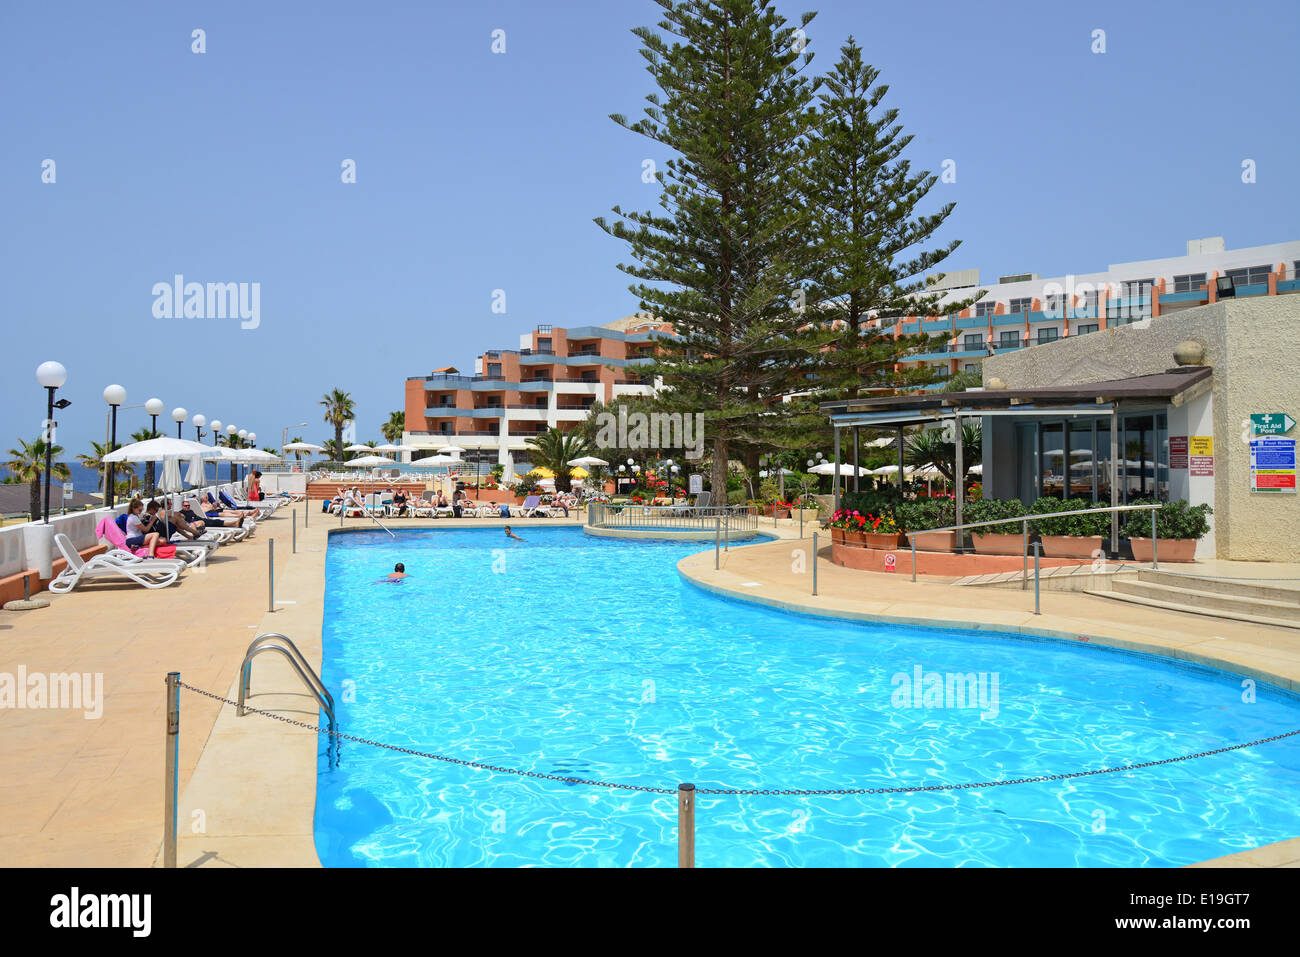 Swimming Pool Dolmen Resort Hotel Saint Paul 39 S Bay San Pawl Stock Photo Royalty Free Image